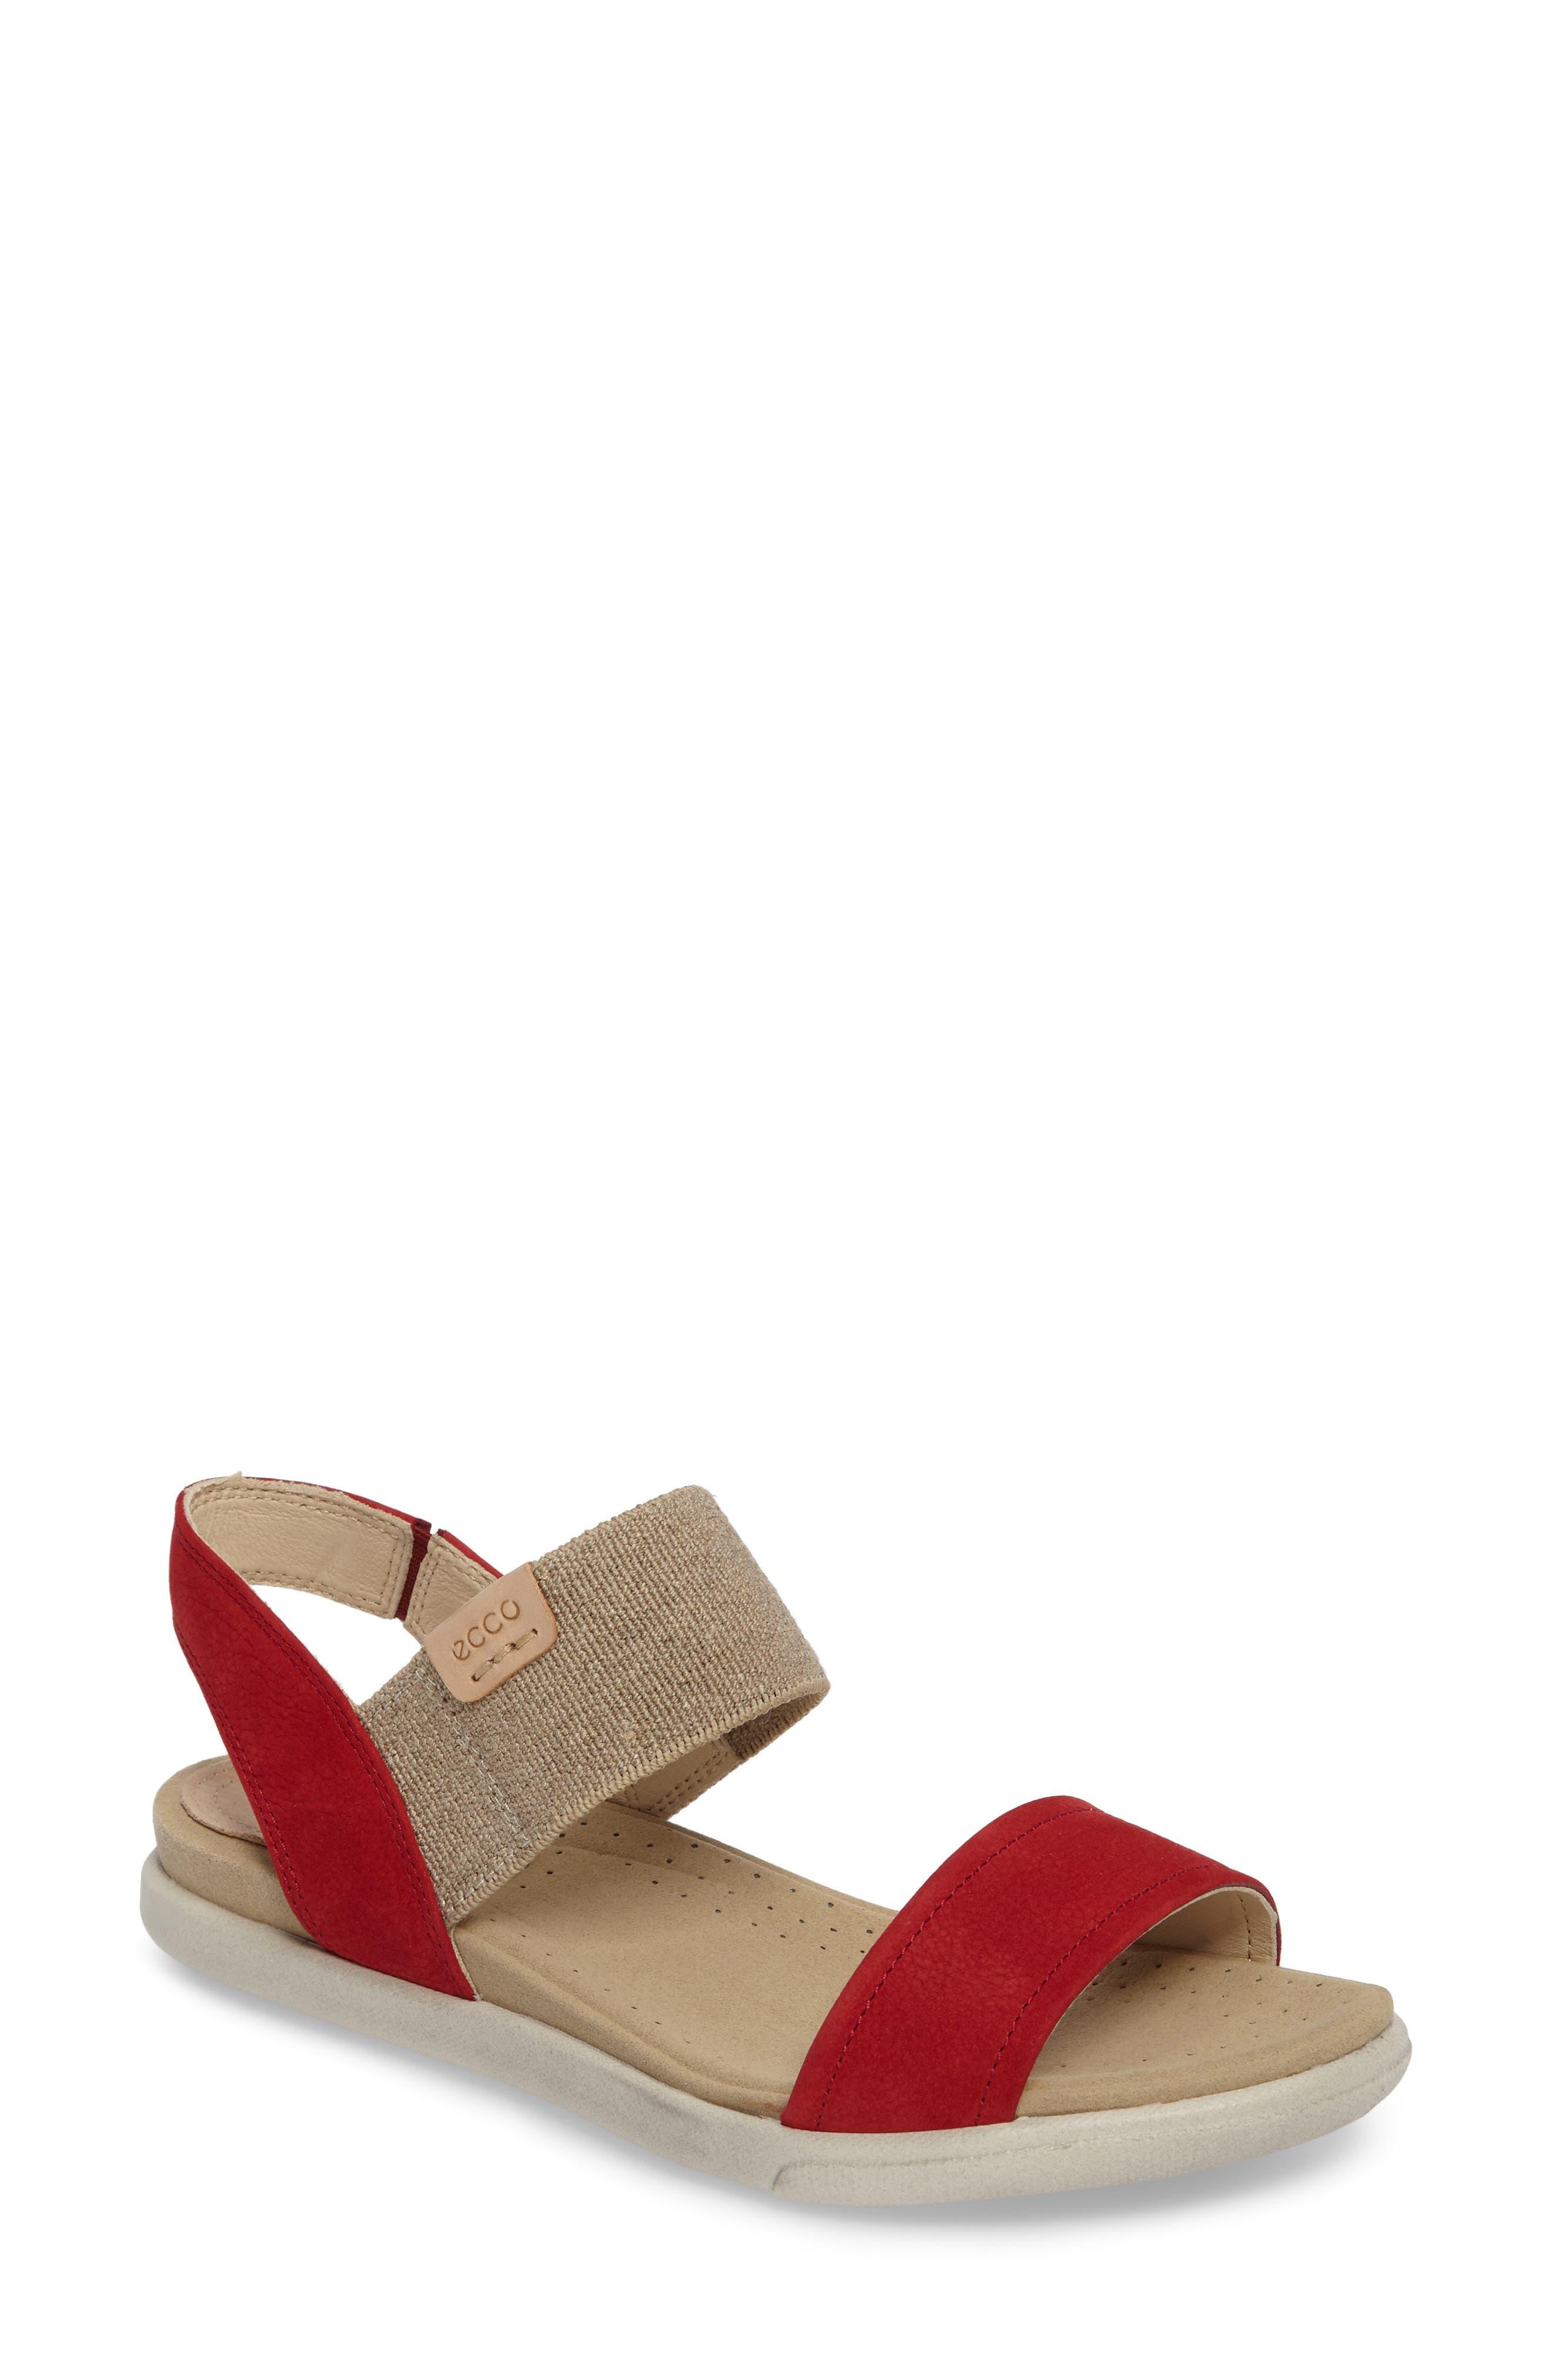 'Damara' Sandal,                         Main,                         color, CHILI RED LEATHER